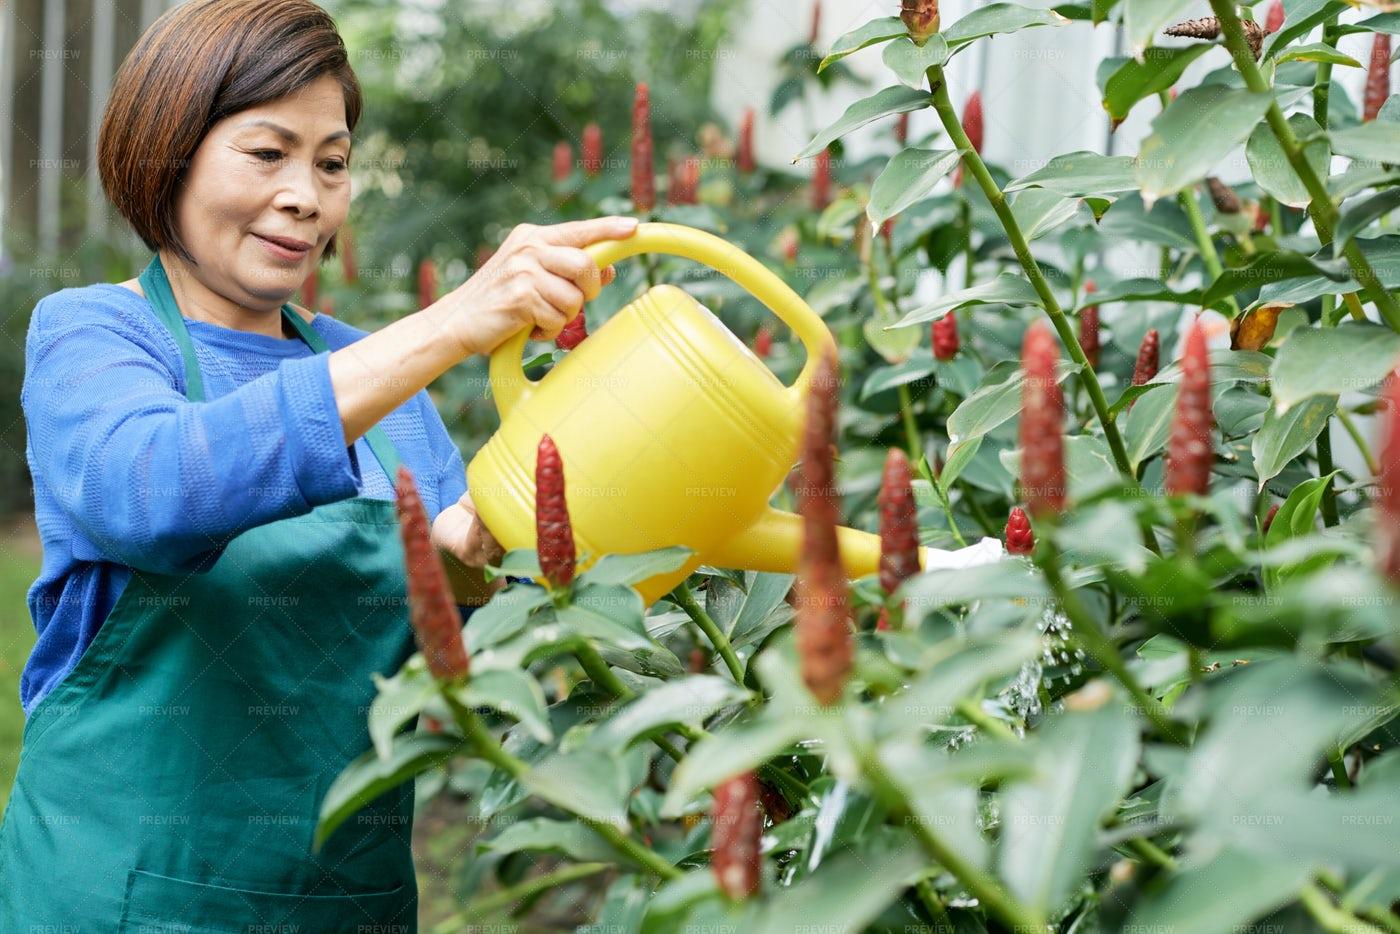 Woman Watering Bushes In Garden: Stock Photos